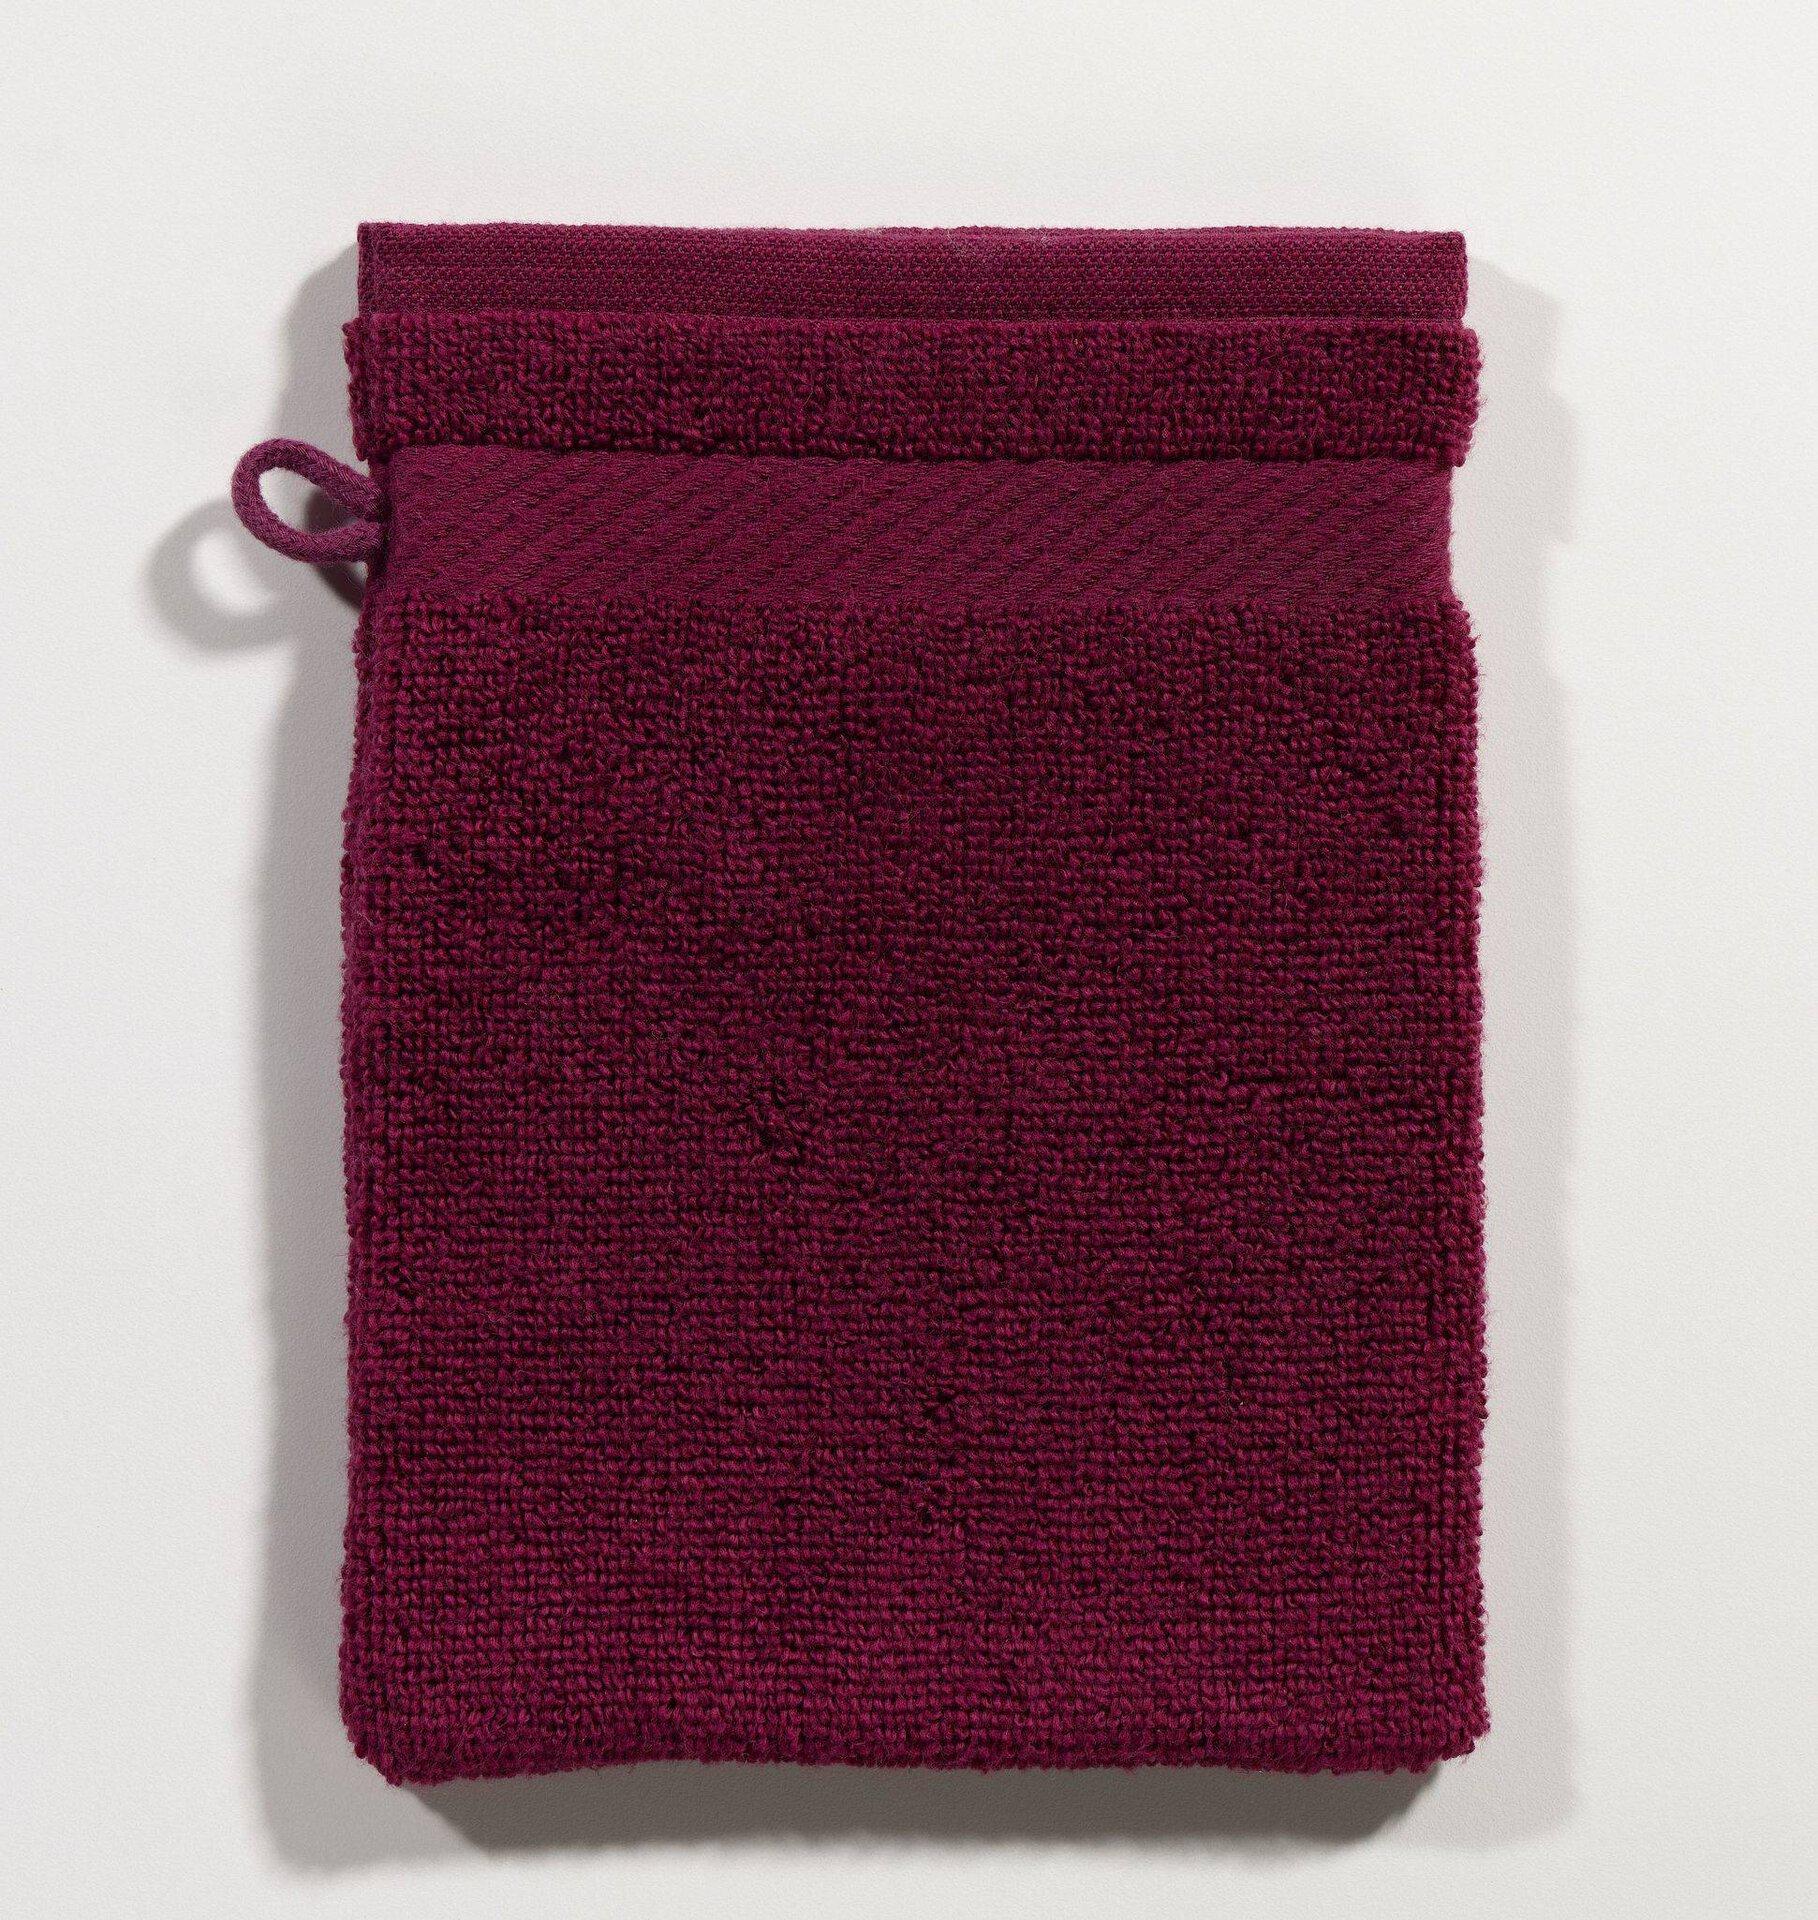 Waschhandschuh Micro Baumwolle Casa Nova Textil rot 16 x 21 cm